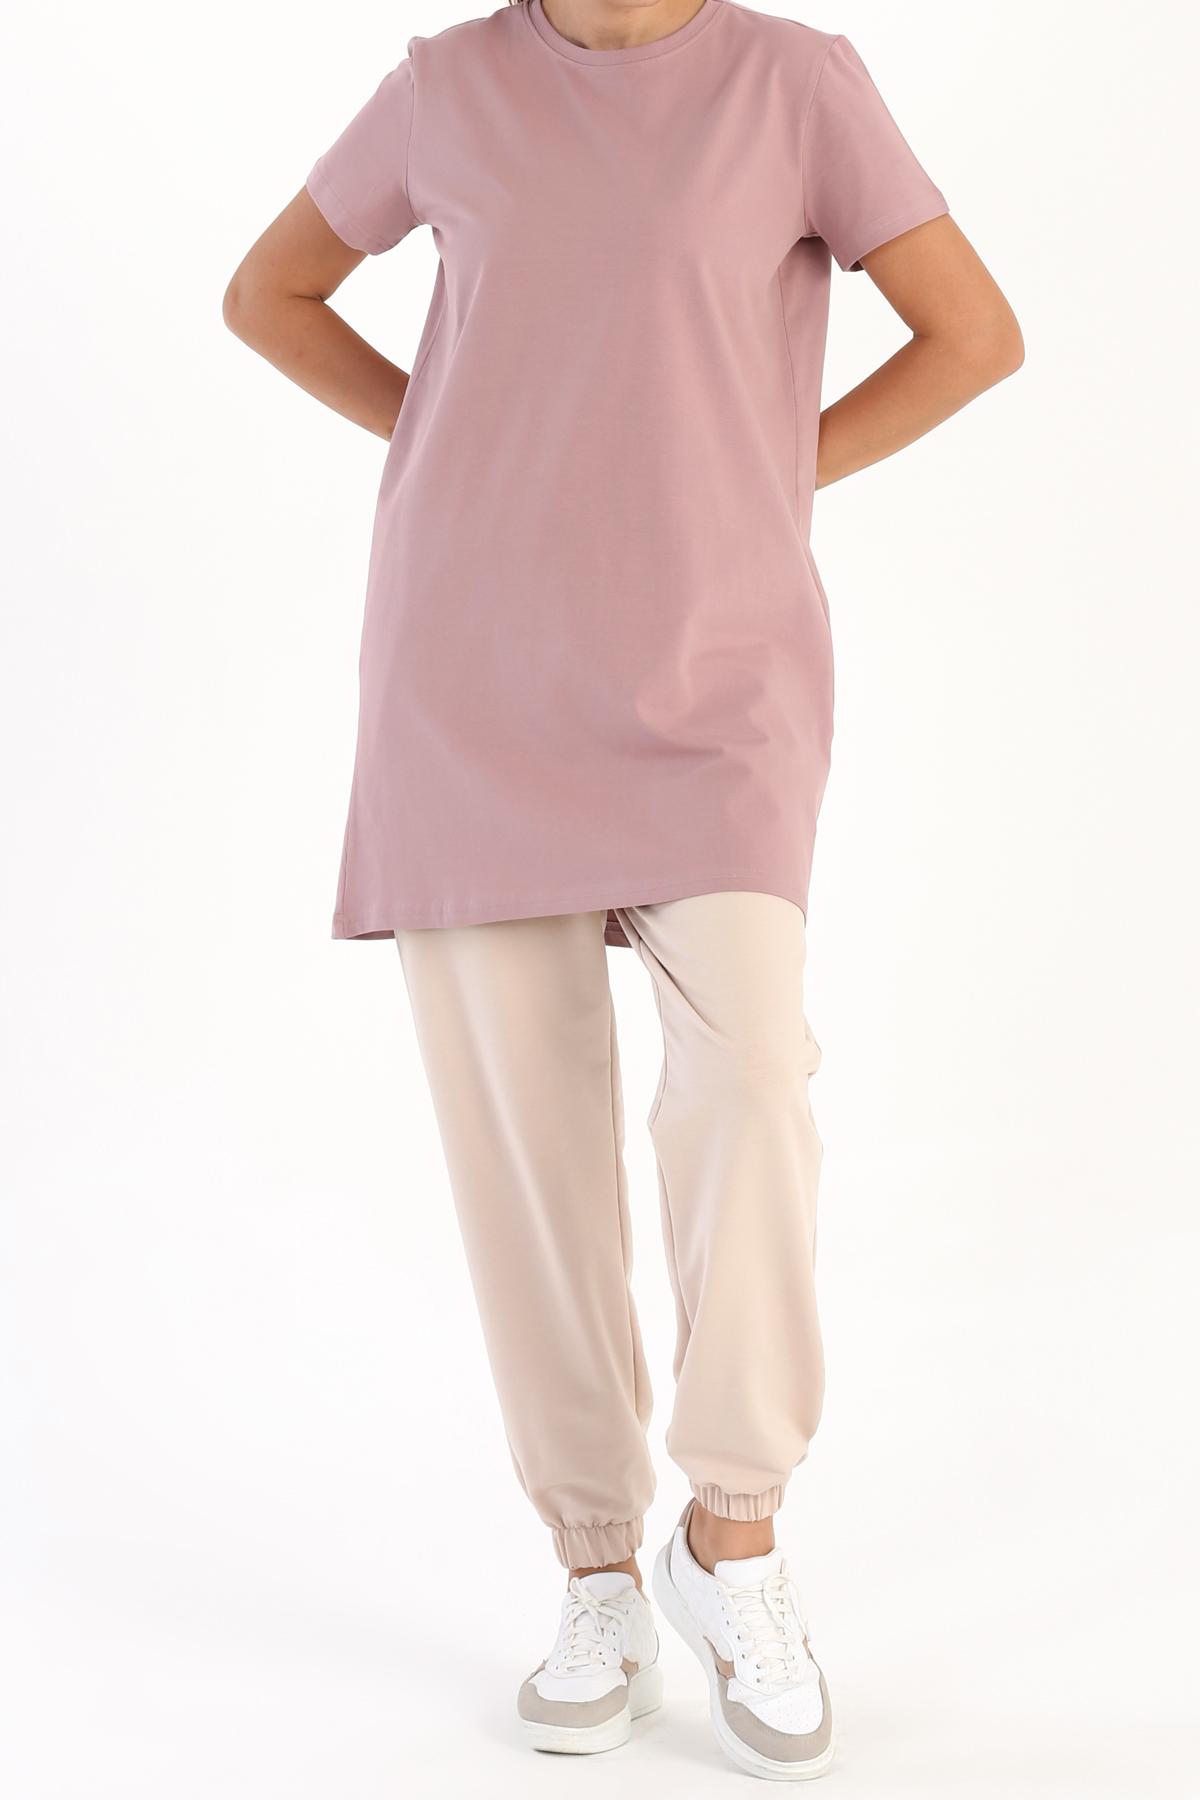 Basic Pamuklu Kısa Kollu T-Shirt Tunik